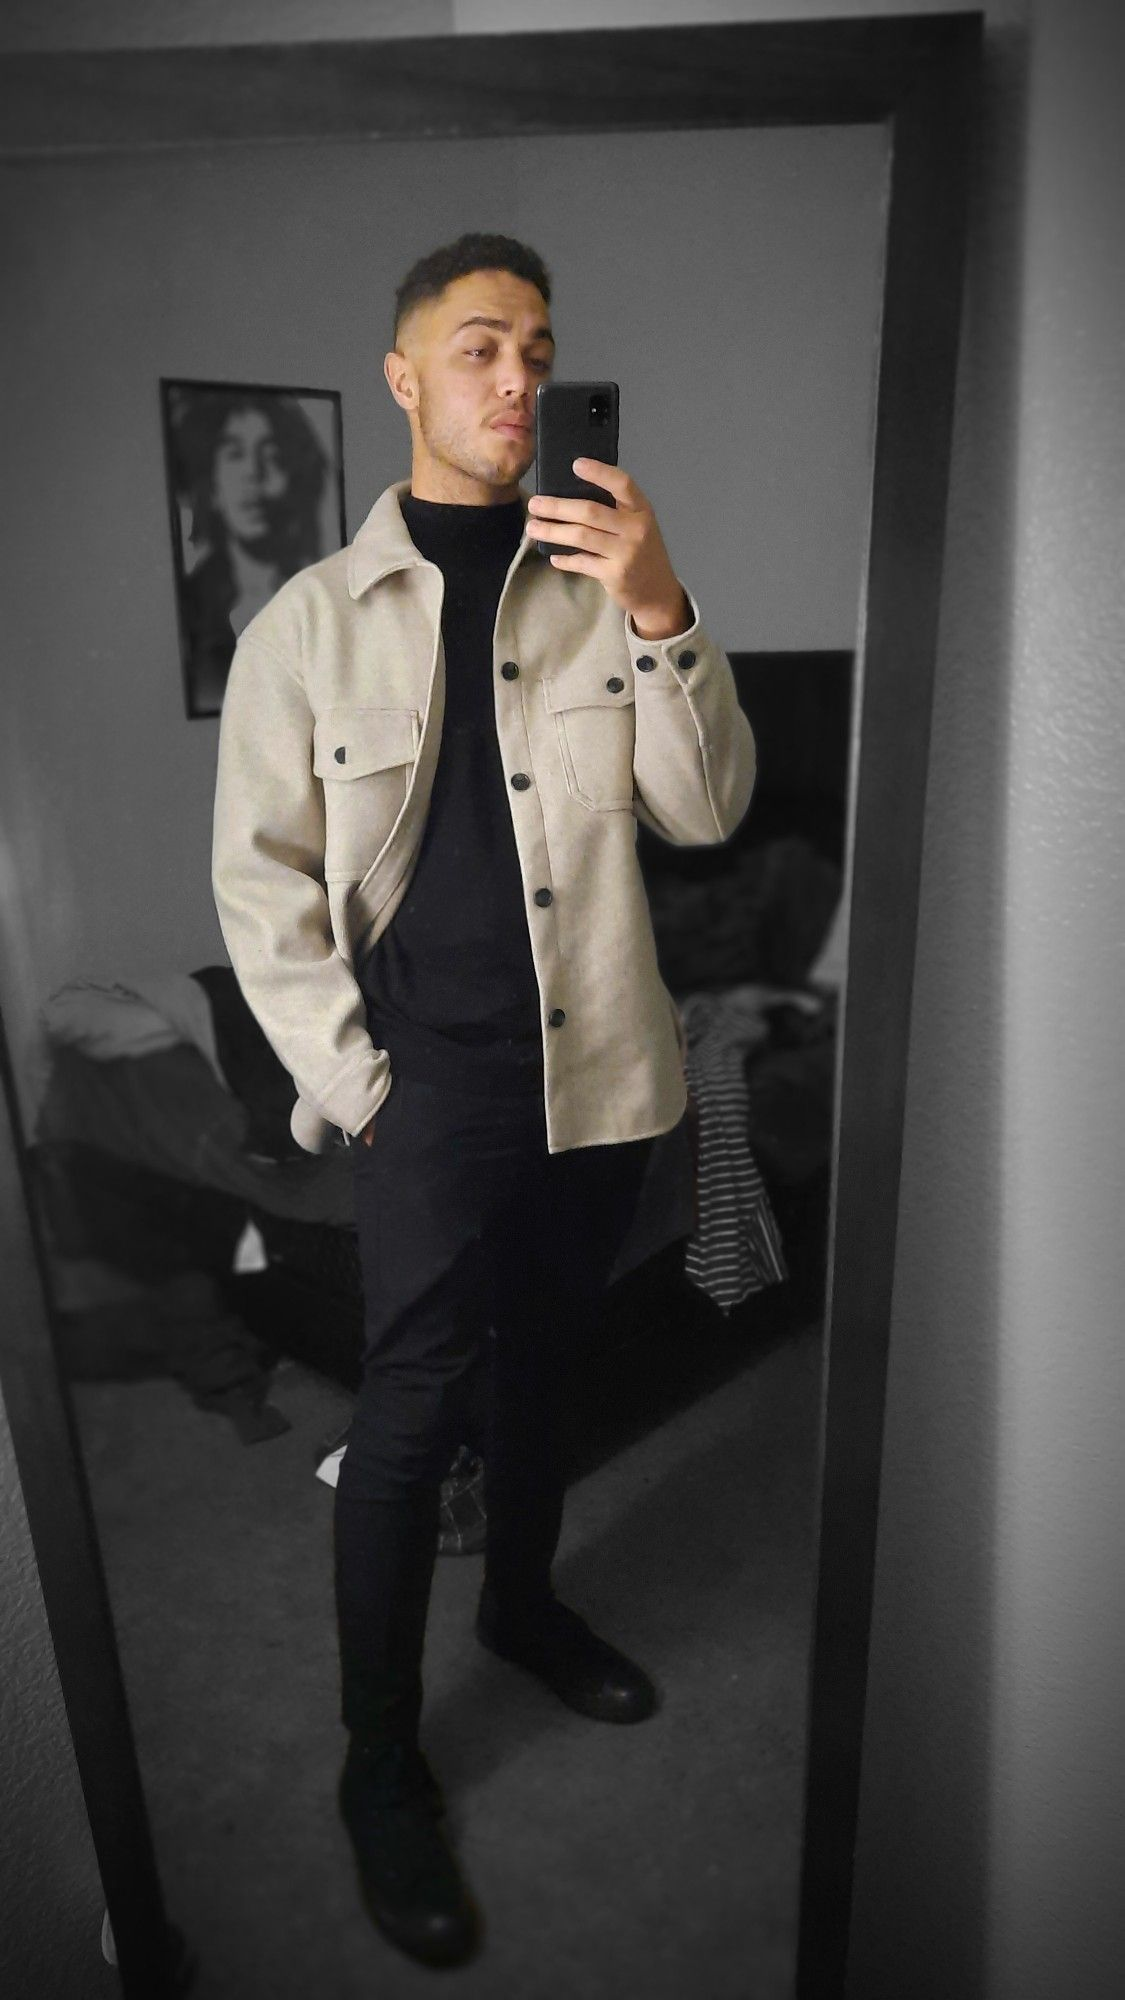 Black Turtleneck From Hm Black Slim Fit Dress Pants Tan Coupe Comfy Fit Coat Black Slim Fit Dress Pants Mens Outfits Slim Fit Dress Pants [ 2000 x 1125 Pixel ]